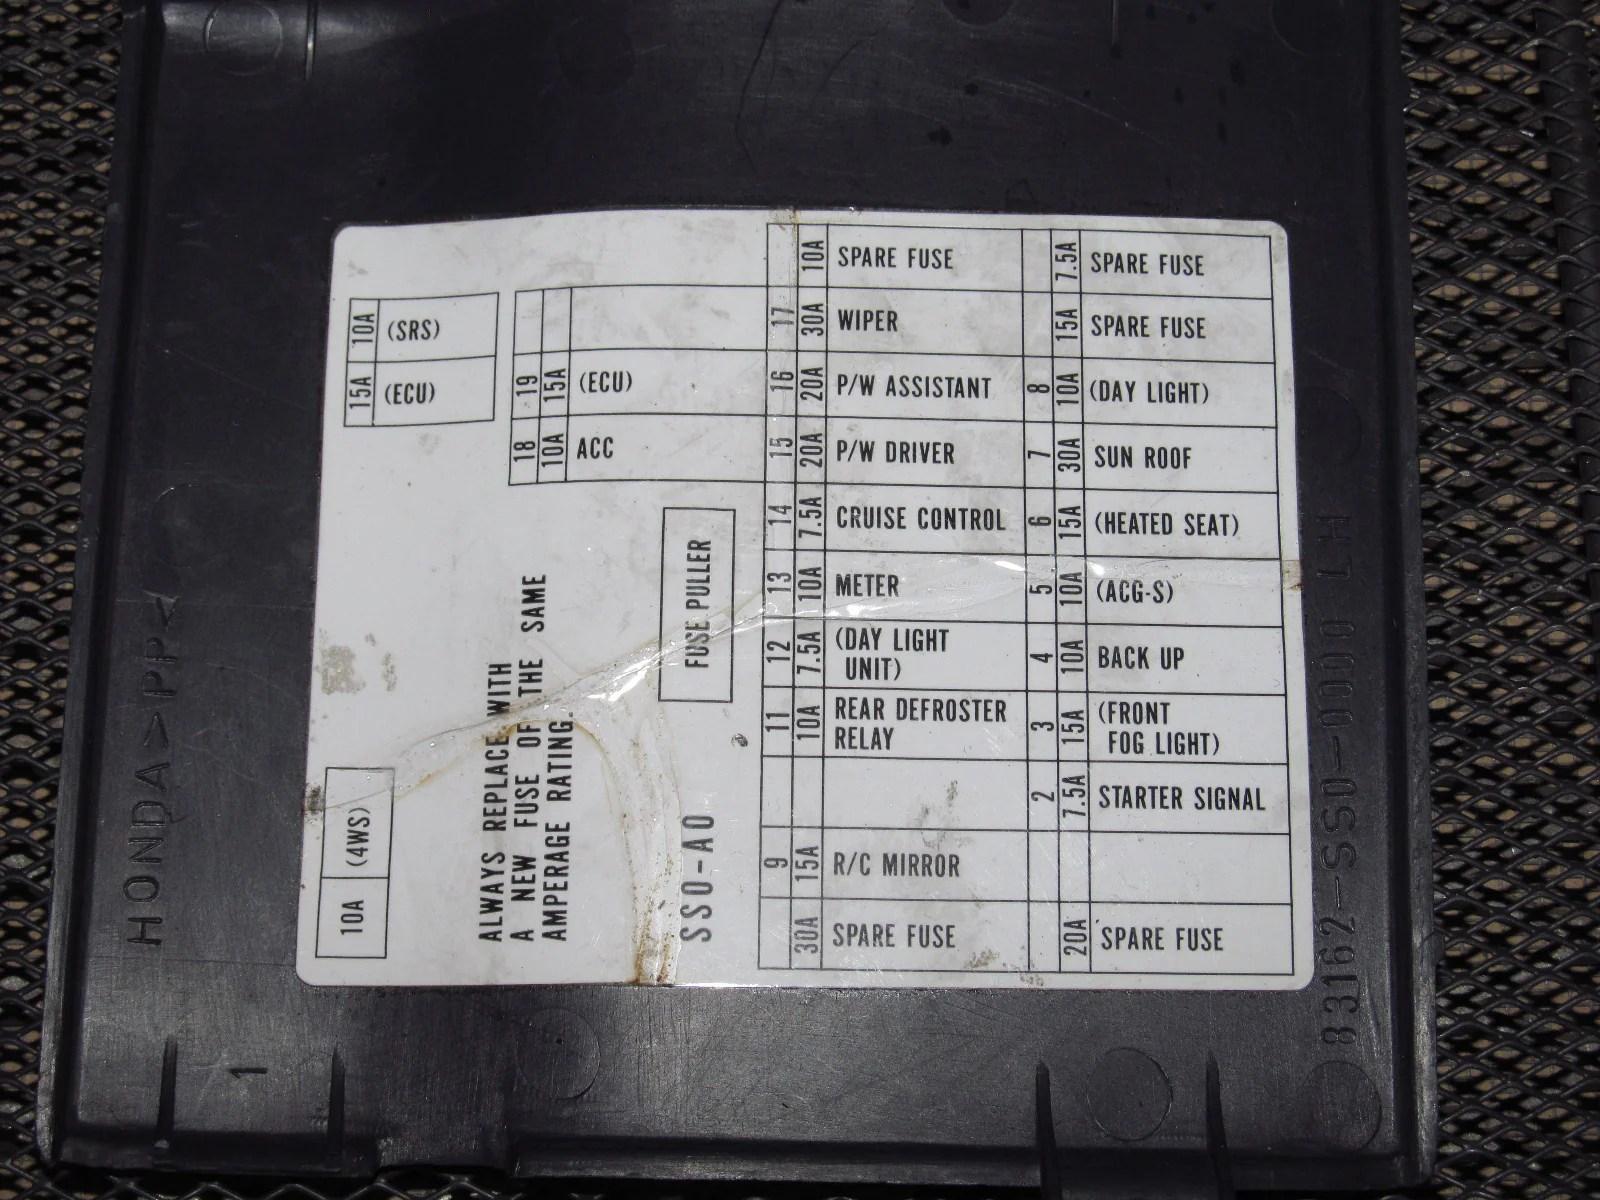 hight resolution of 92 96 prelude fuse box wiring diagram centre mix 92 93 94 95 96 honda prelude